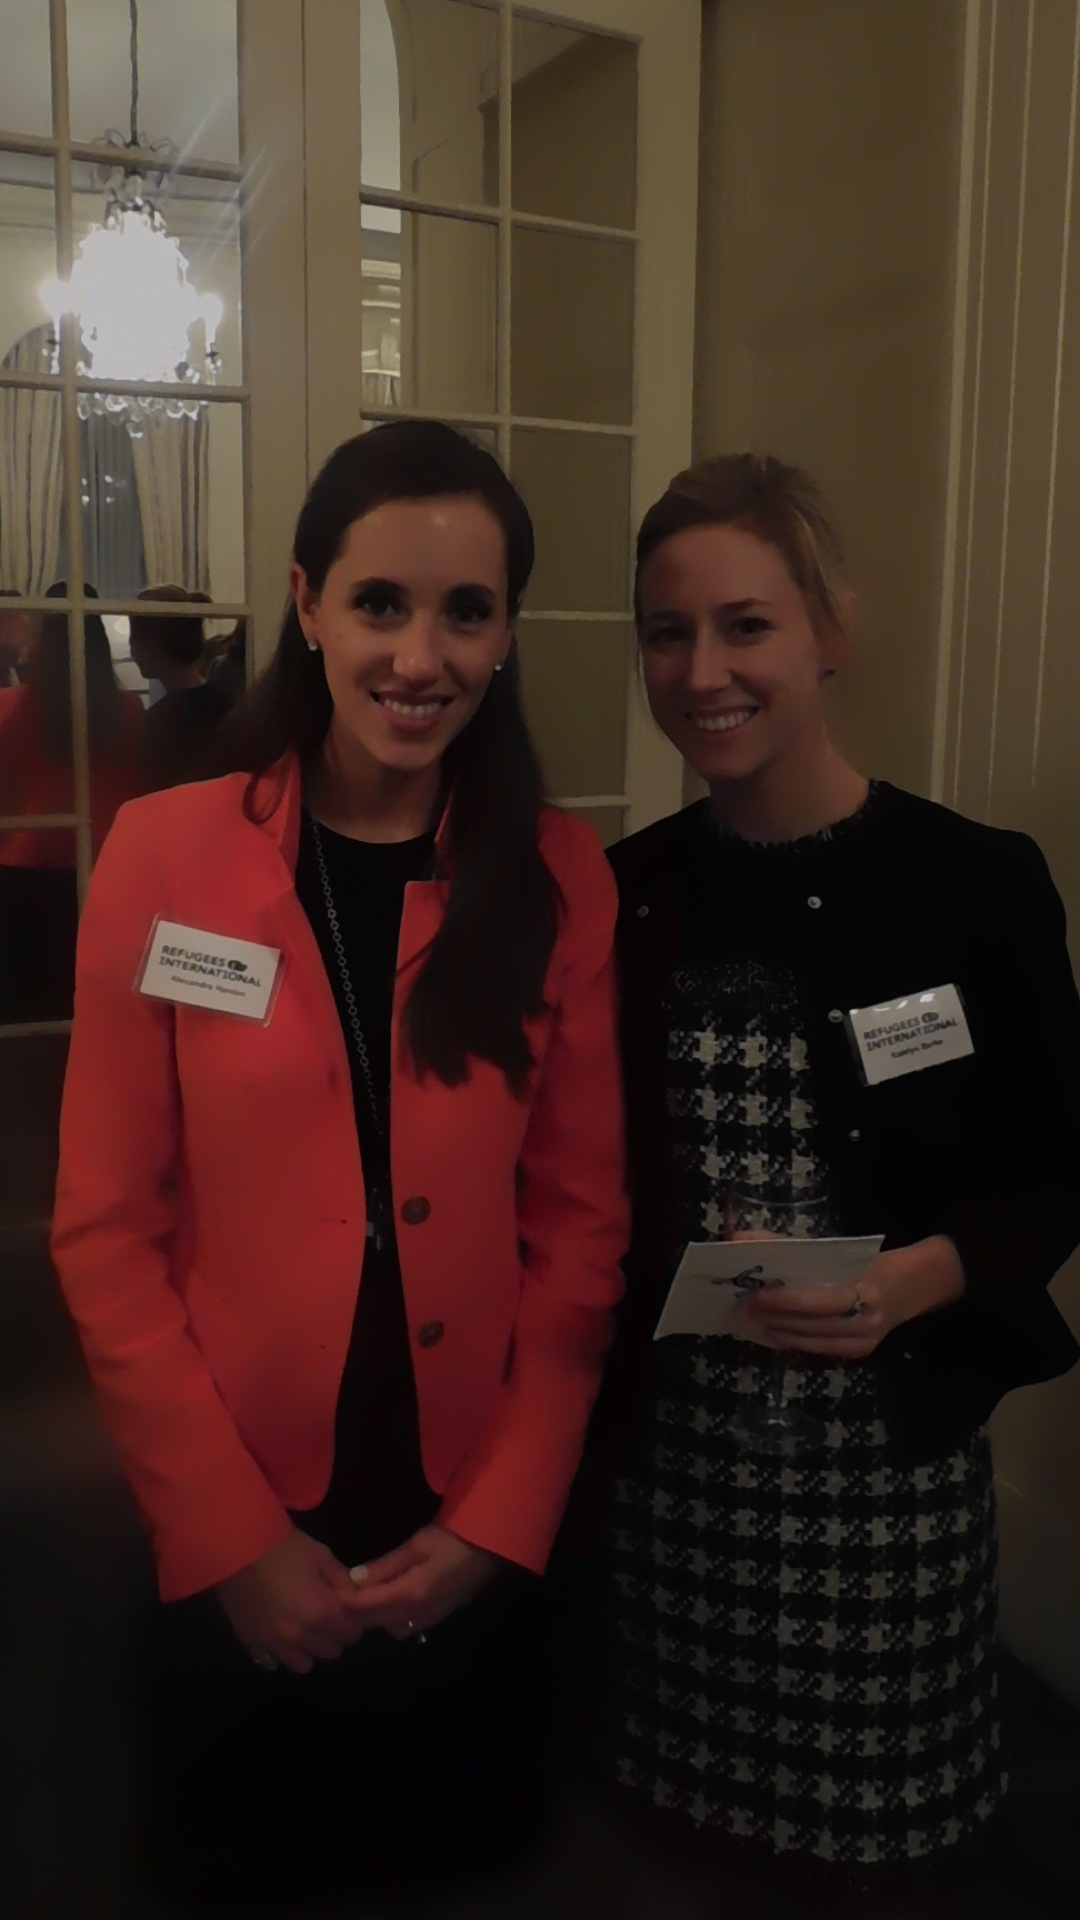 Alexandra Hanlon and Katelyn Burke